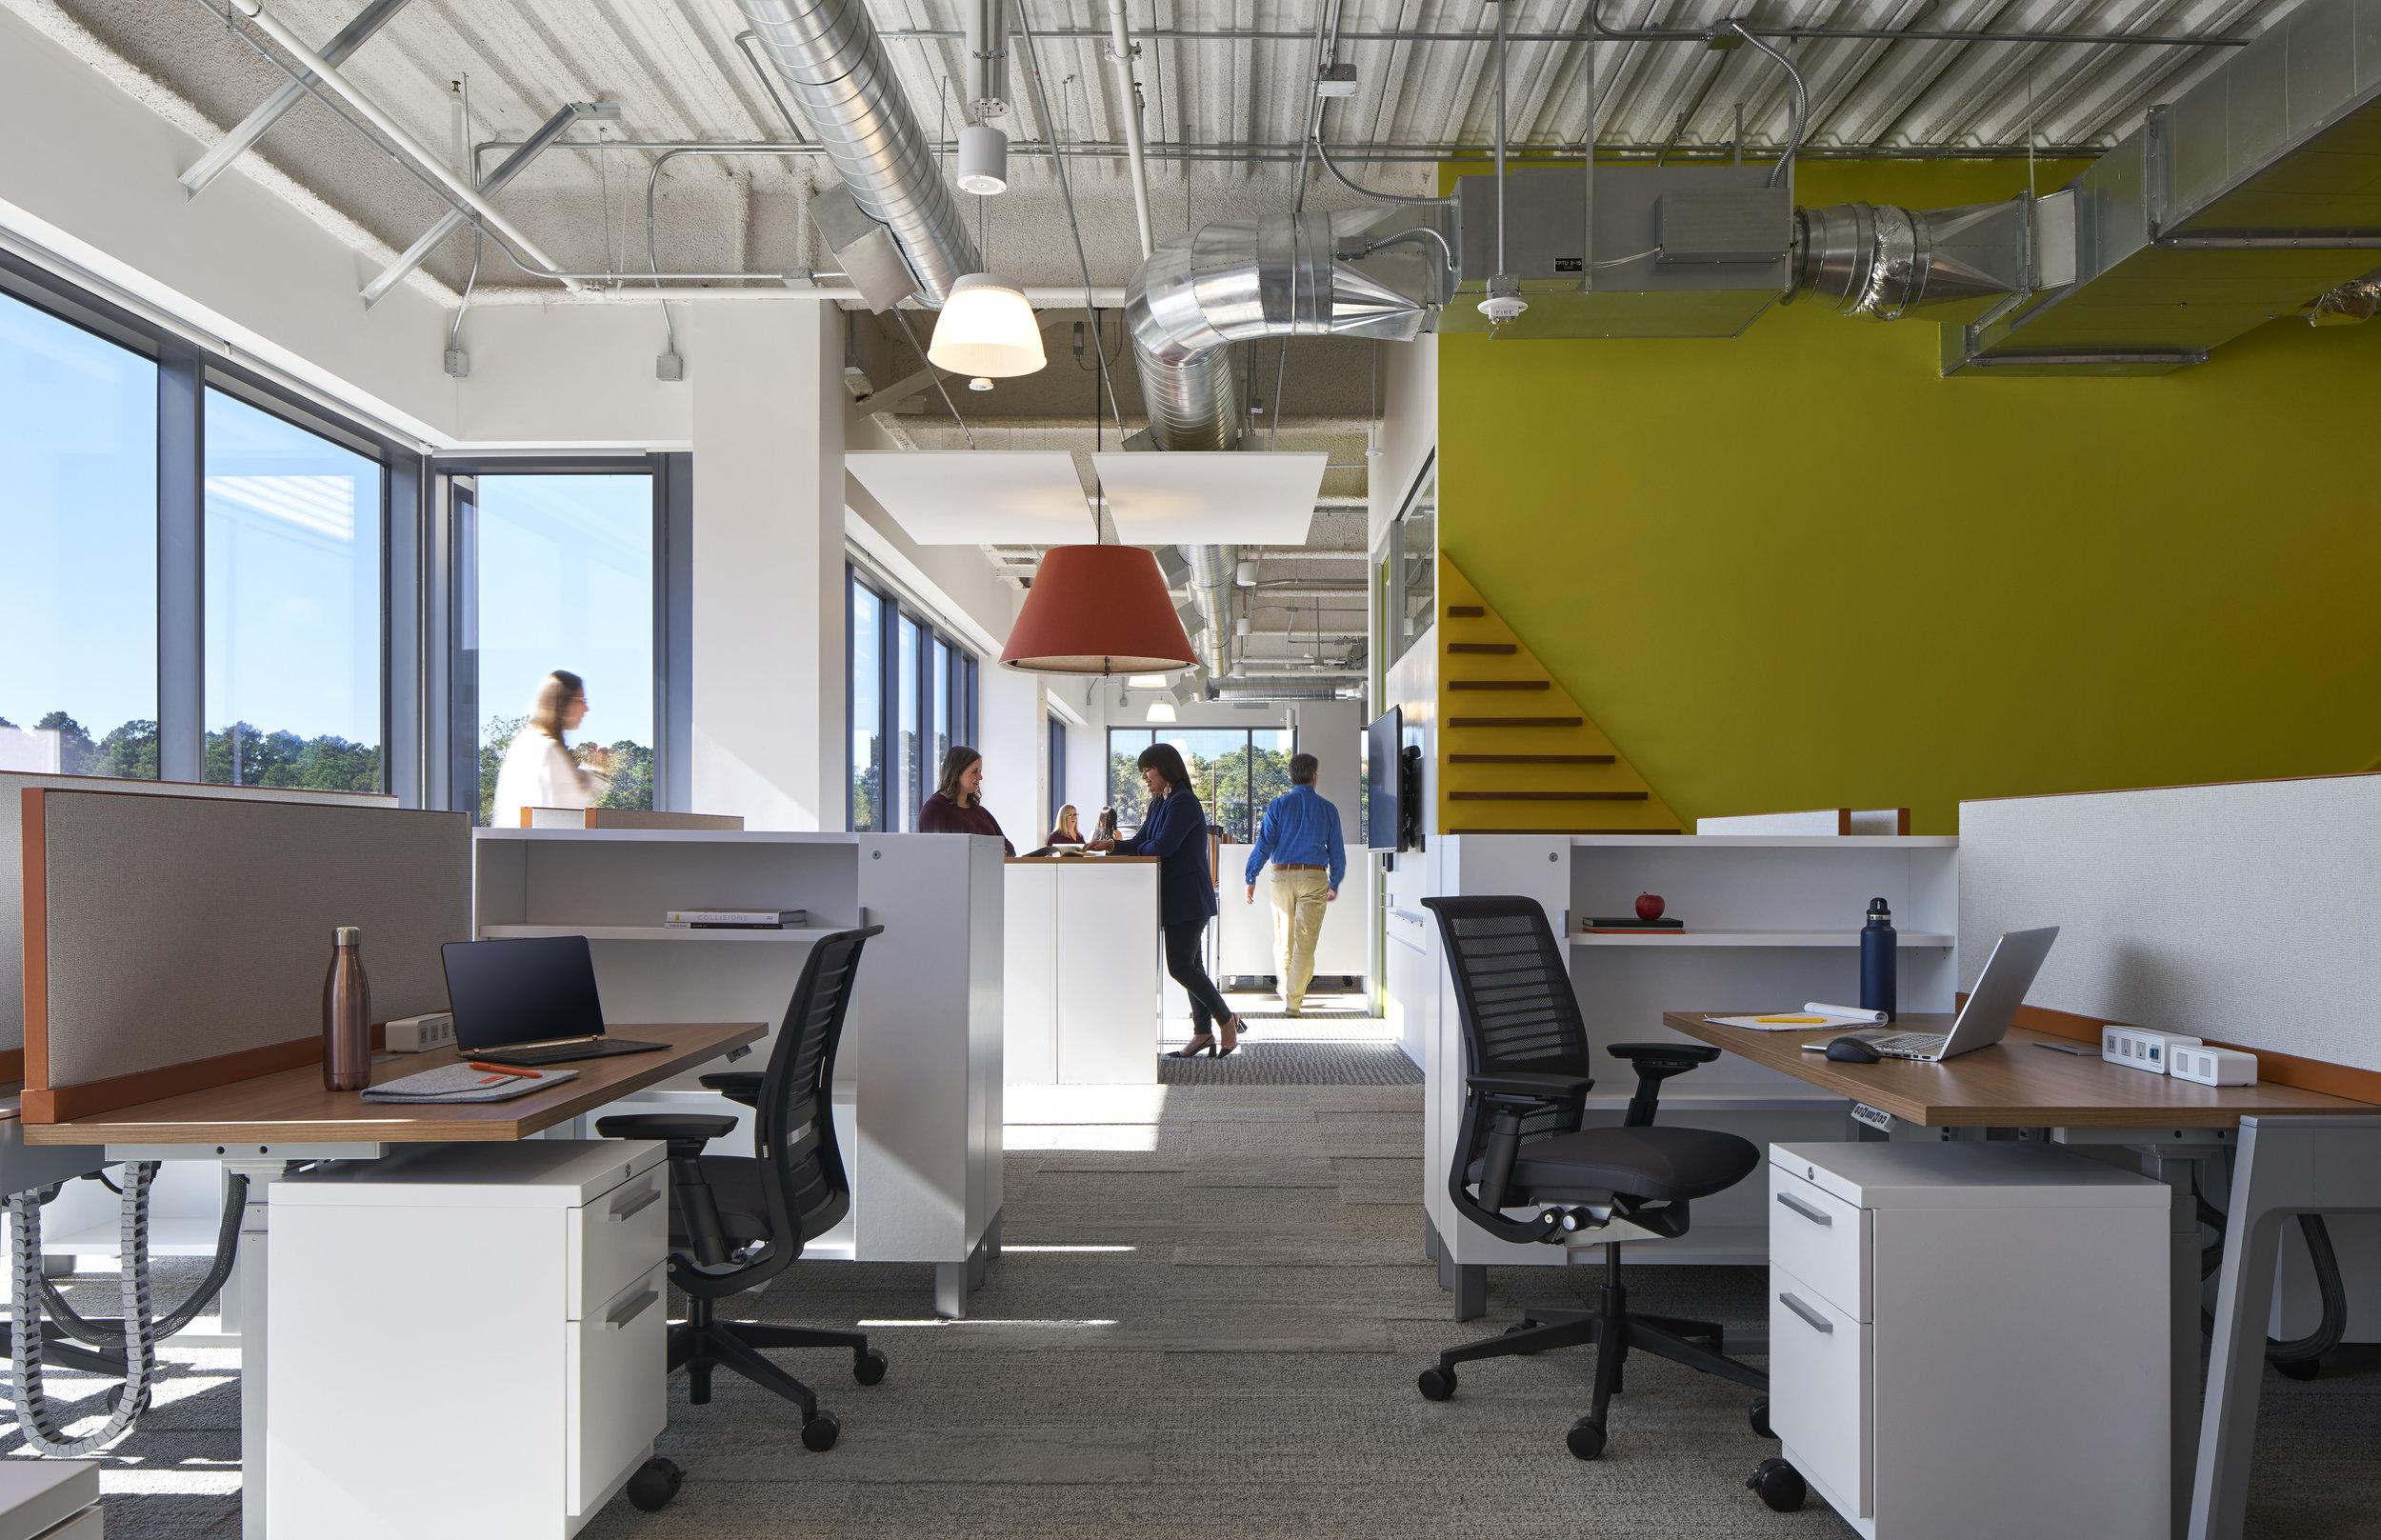 Work Stations, Photo Credit: Scott McDonald @ Gray City Studios